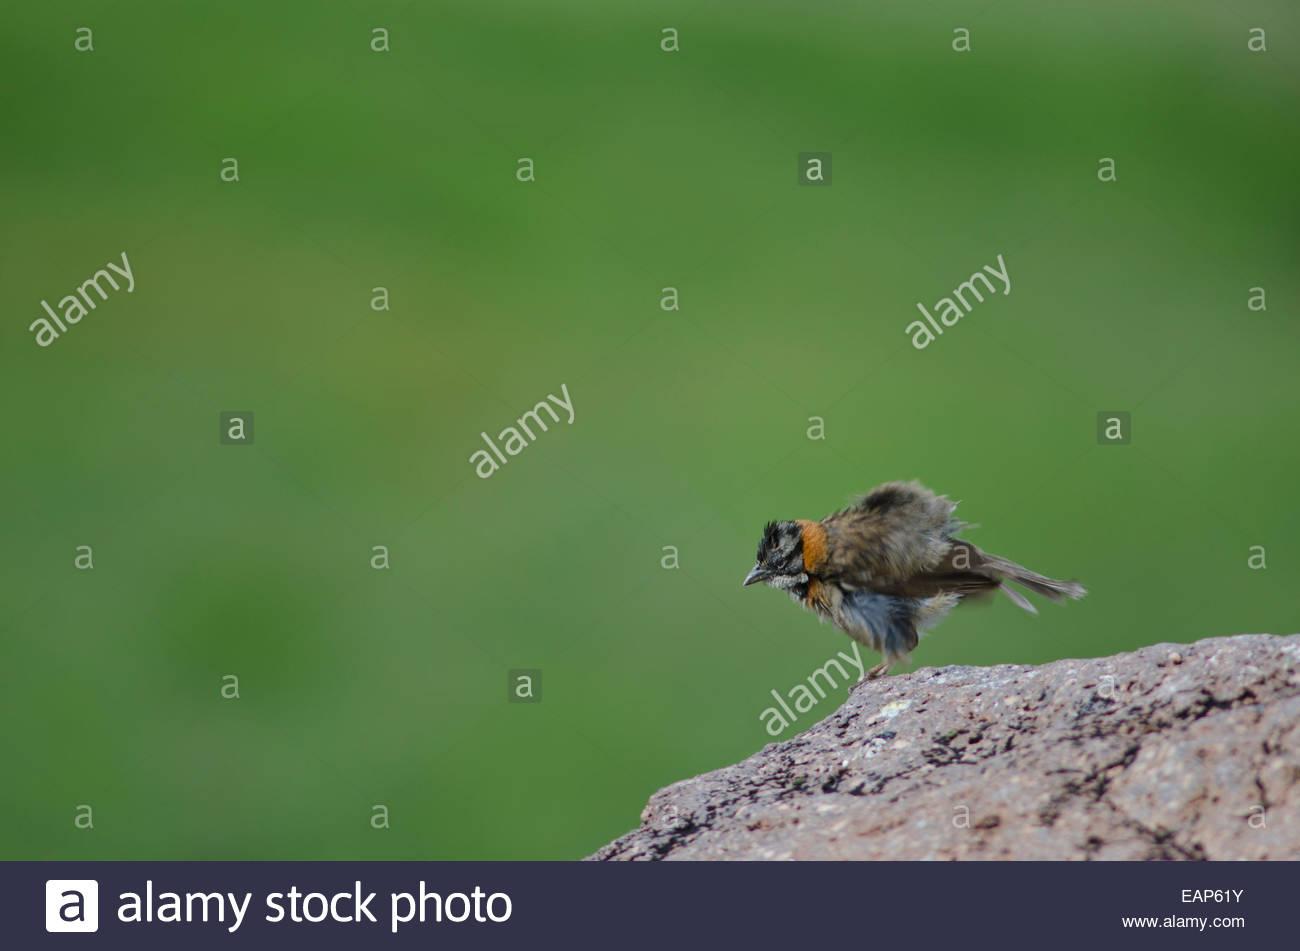 Rufous-collared Sparrow (Zonotrichia capensis). Putre. Arica y Parinacota region. Chile. Stock Photo